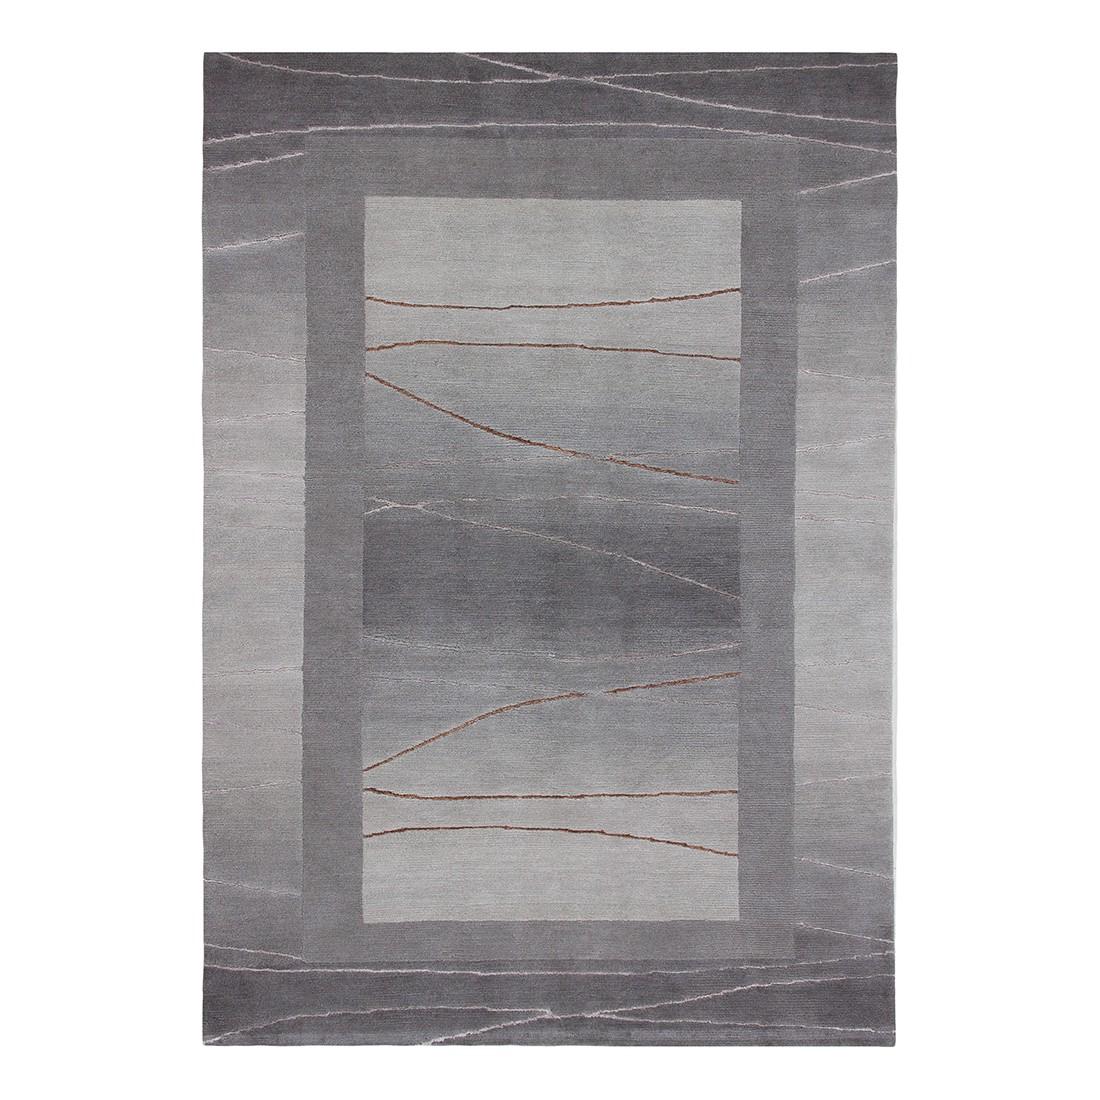 Teppich Linea – Wolle/ Silber – 90 cm x 160 cm, Luxor living bestellen